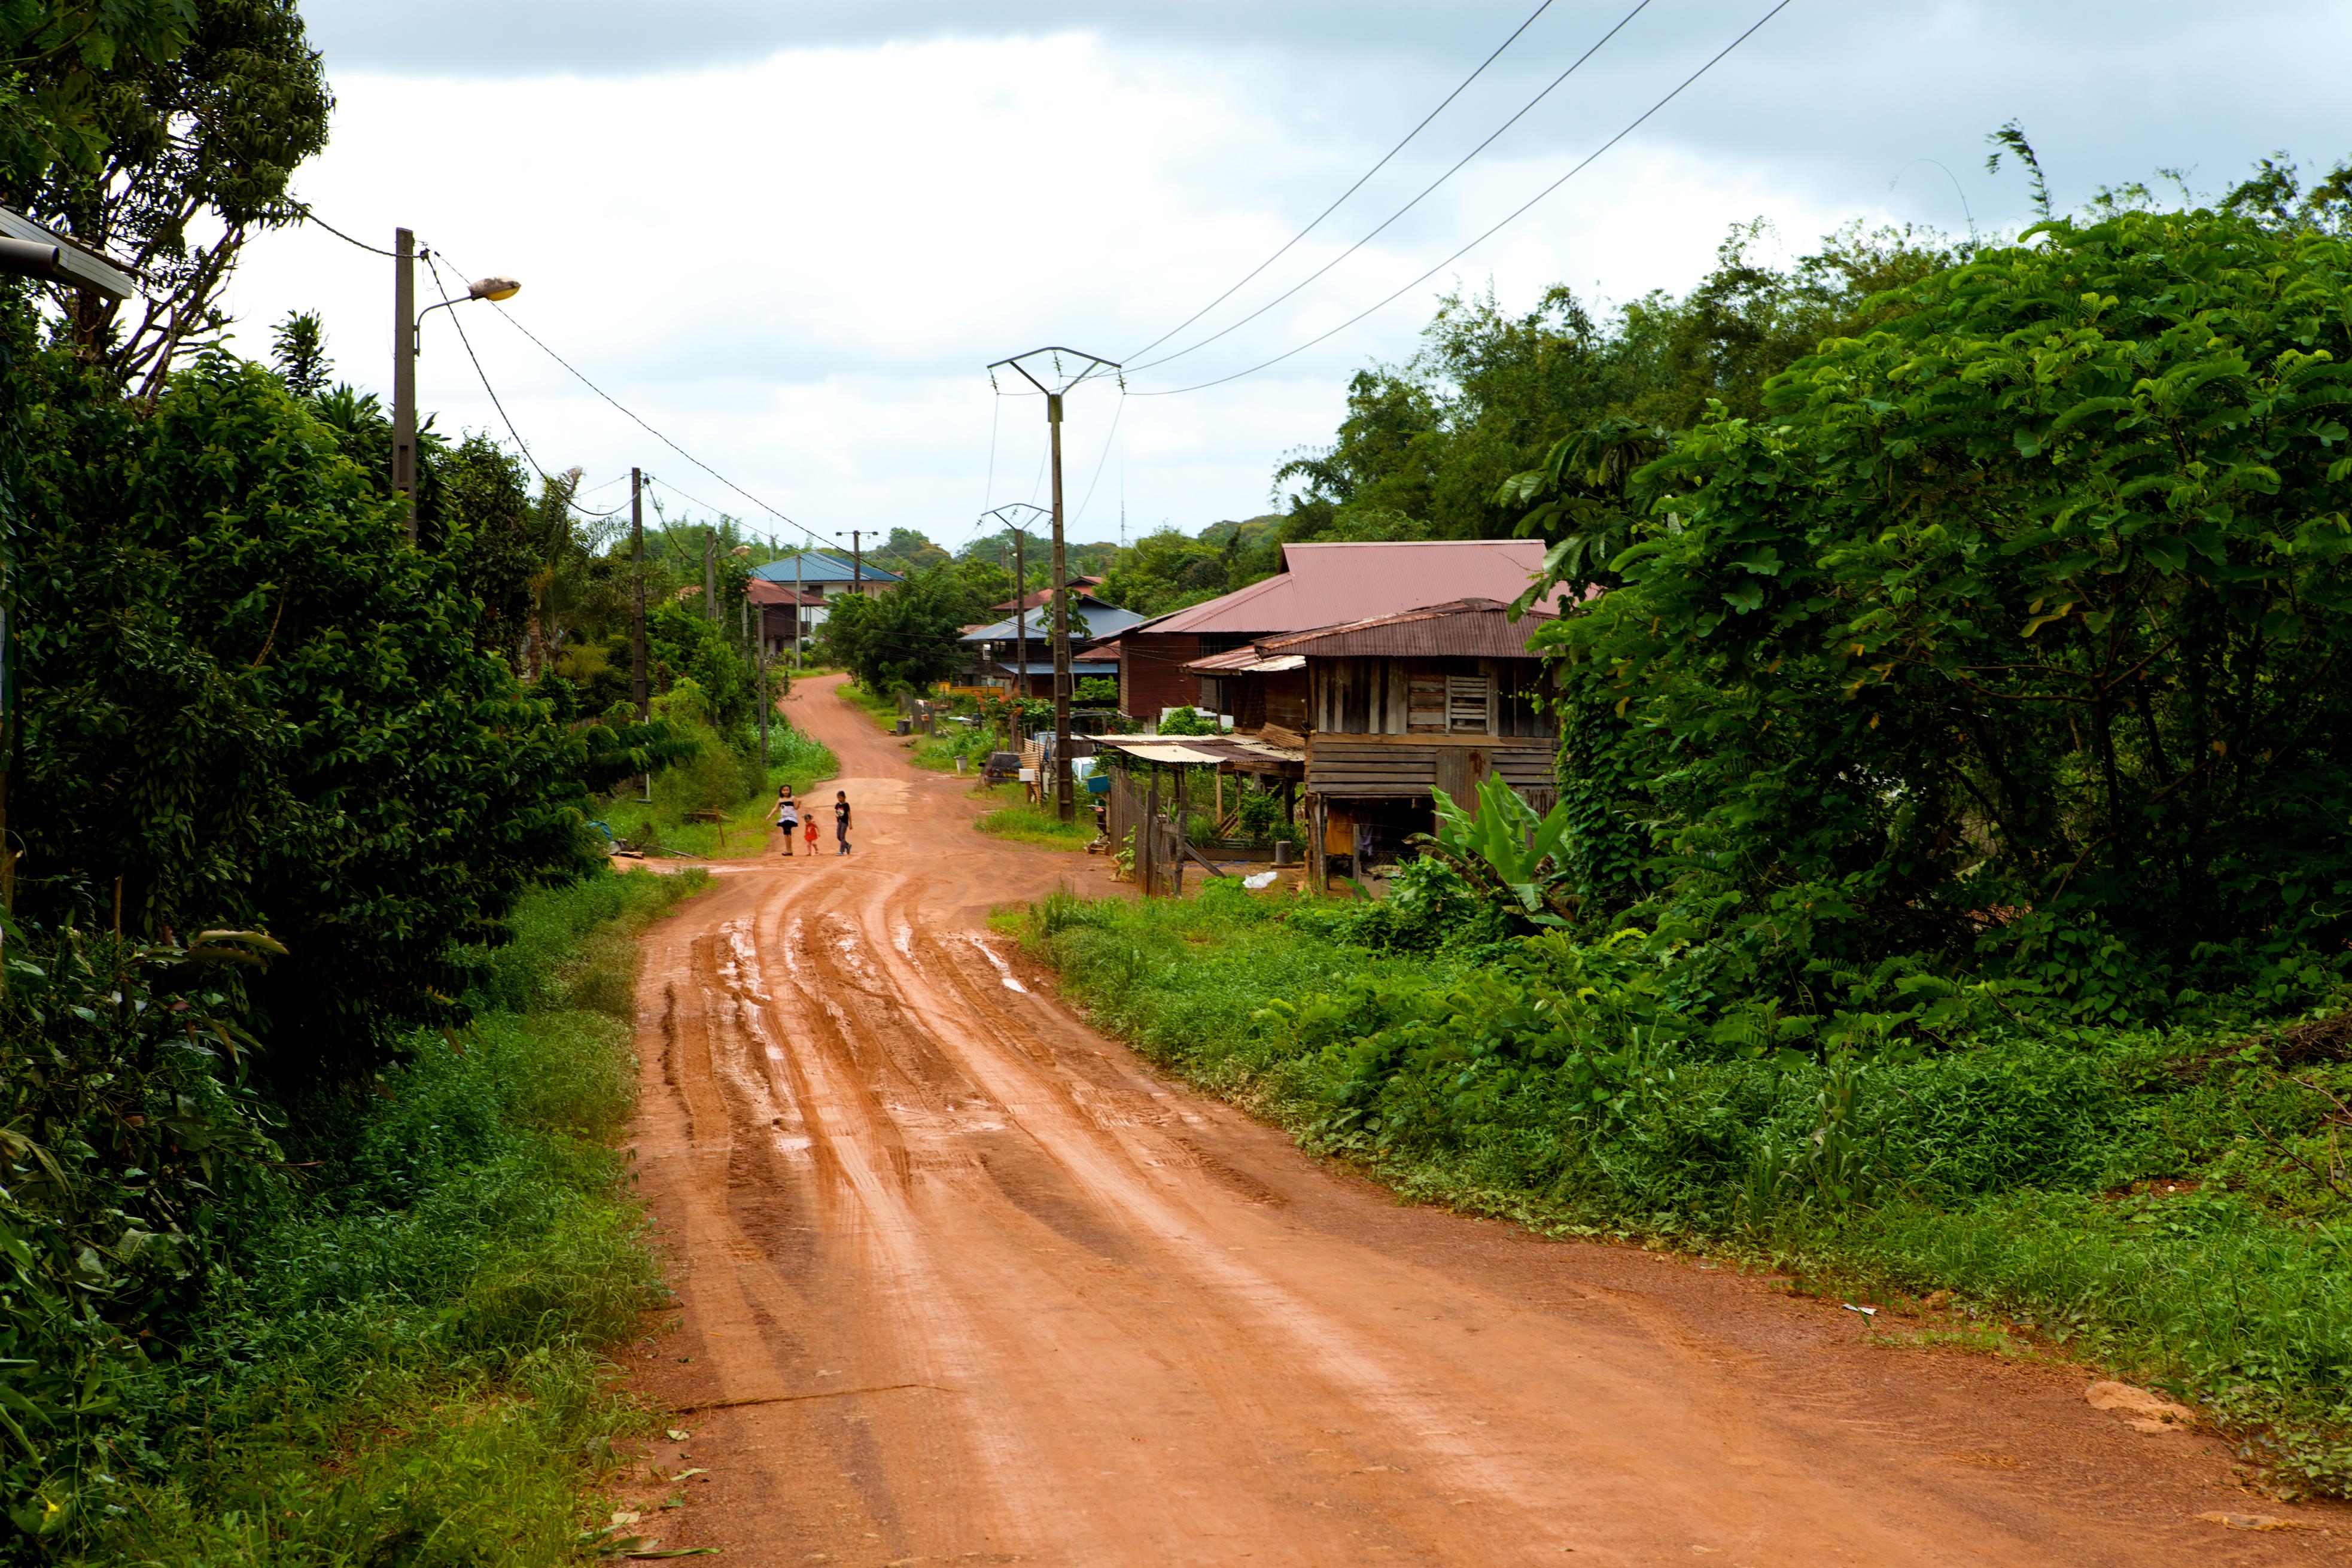 Opinions on Village